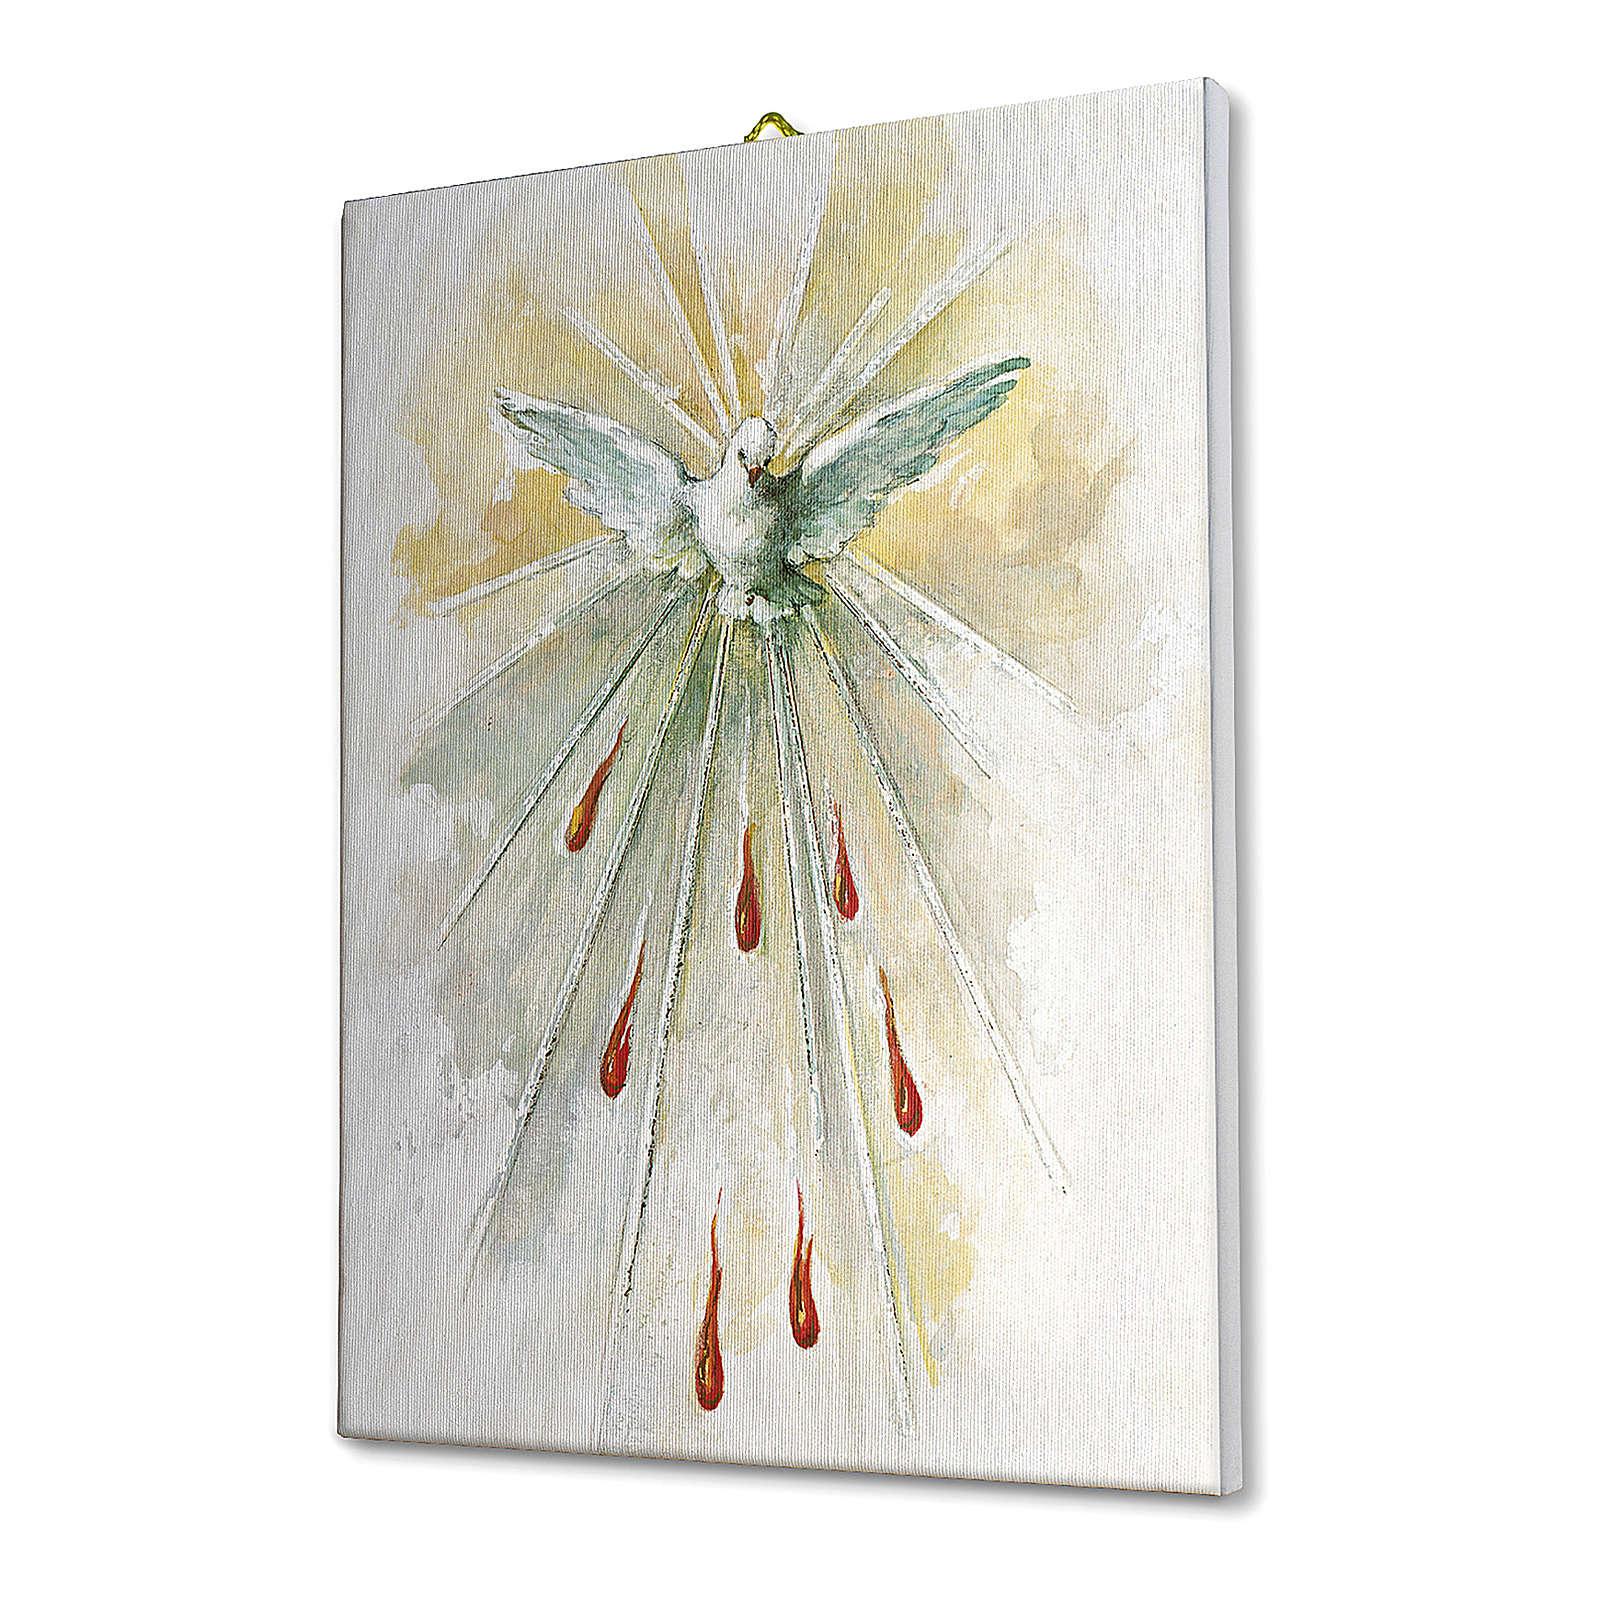 Cuadro sobre tela pictórica Espíritu Santo 40x30 cm 3